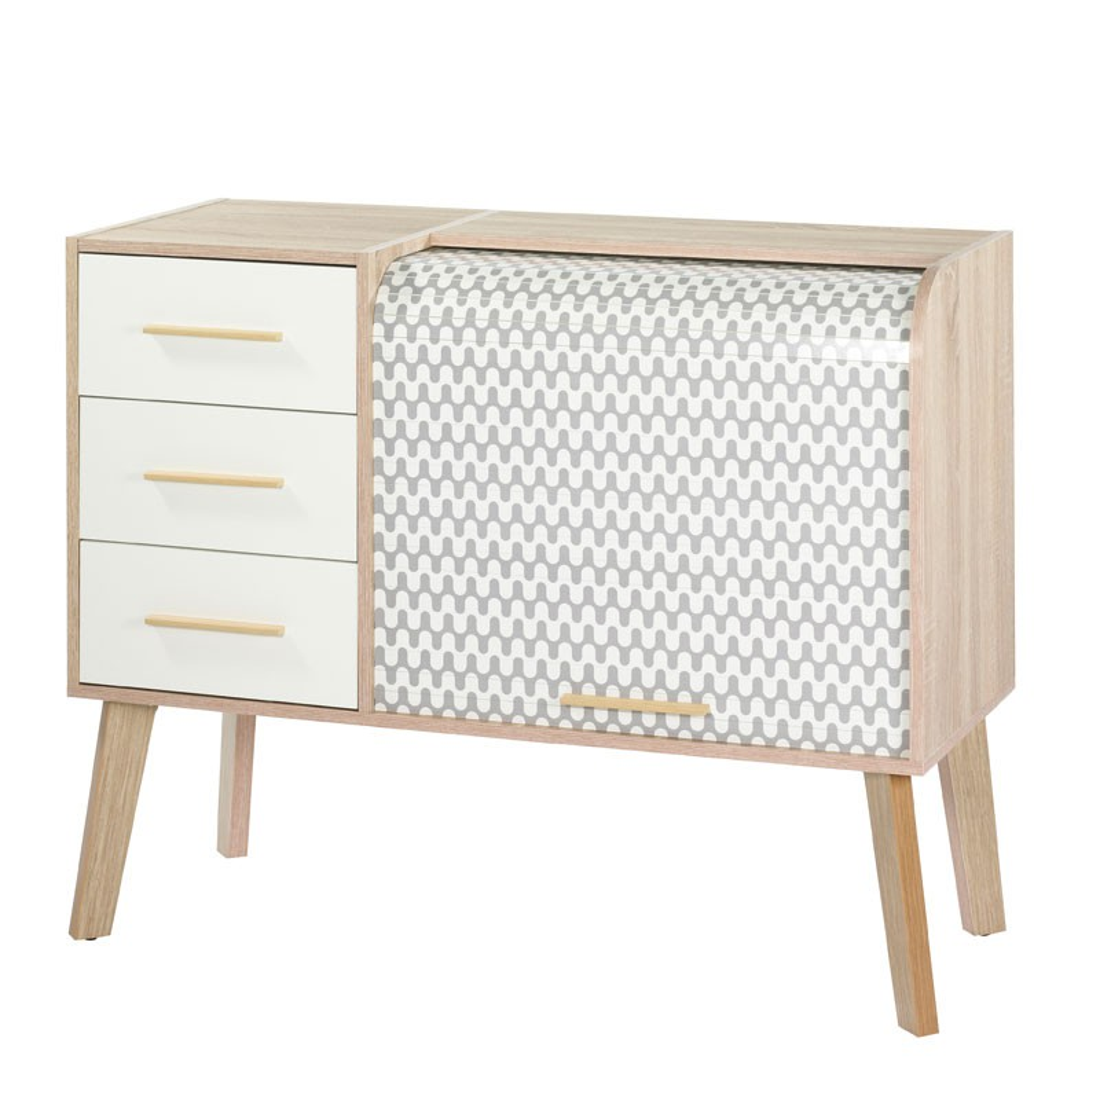 meuble d 39 entr e rideau 3 tiroirs arkos n 5 univers petits meubles. Black Bedroom Furniture Sets. Home Design Ideas